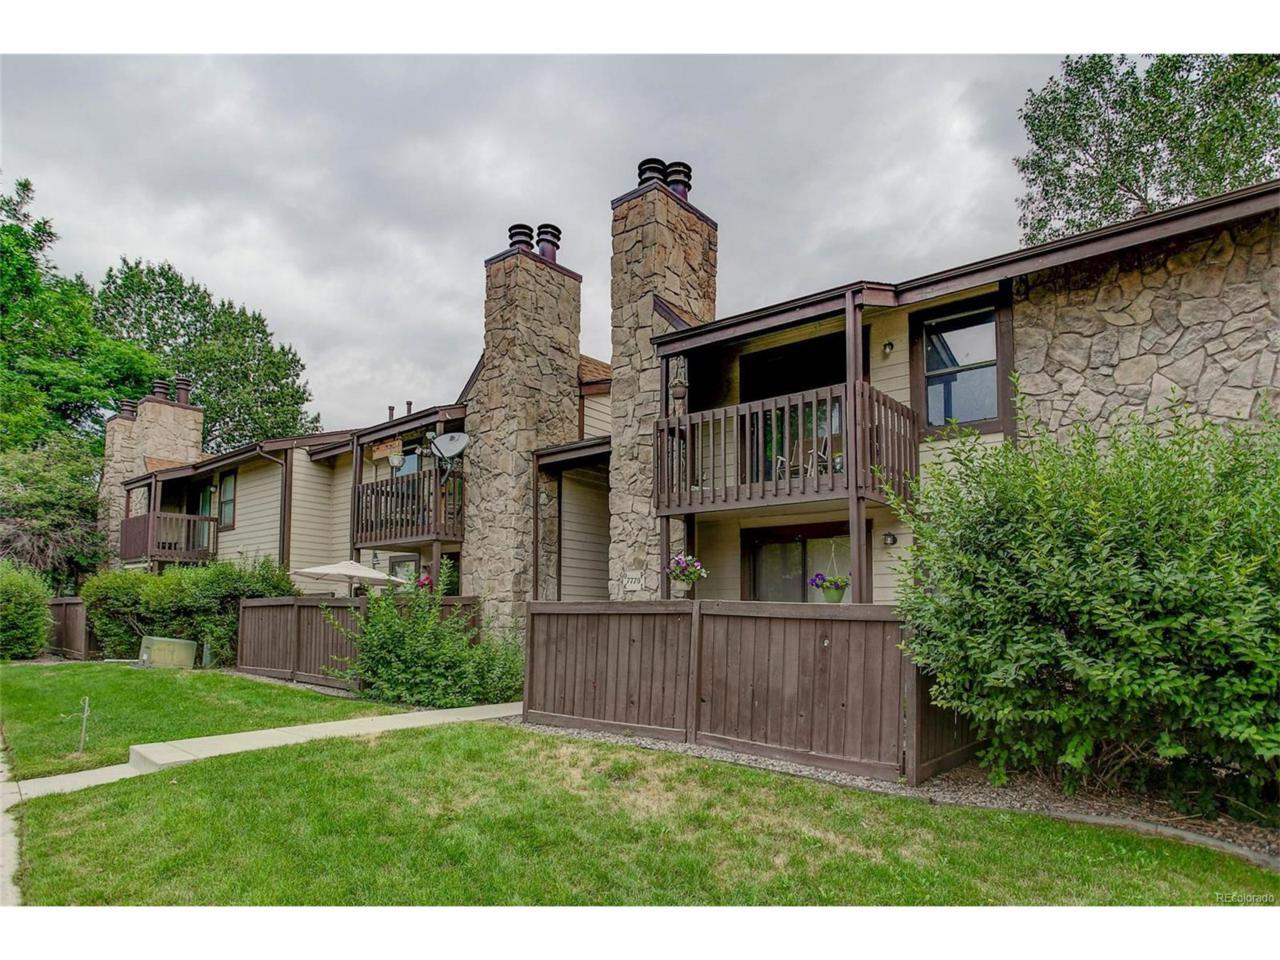 7770 W 87th Drive O, Arvada, CO 80005 (MLS #2975529) :: 8z Real Estate